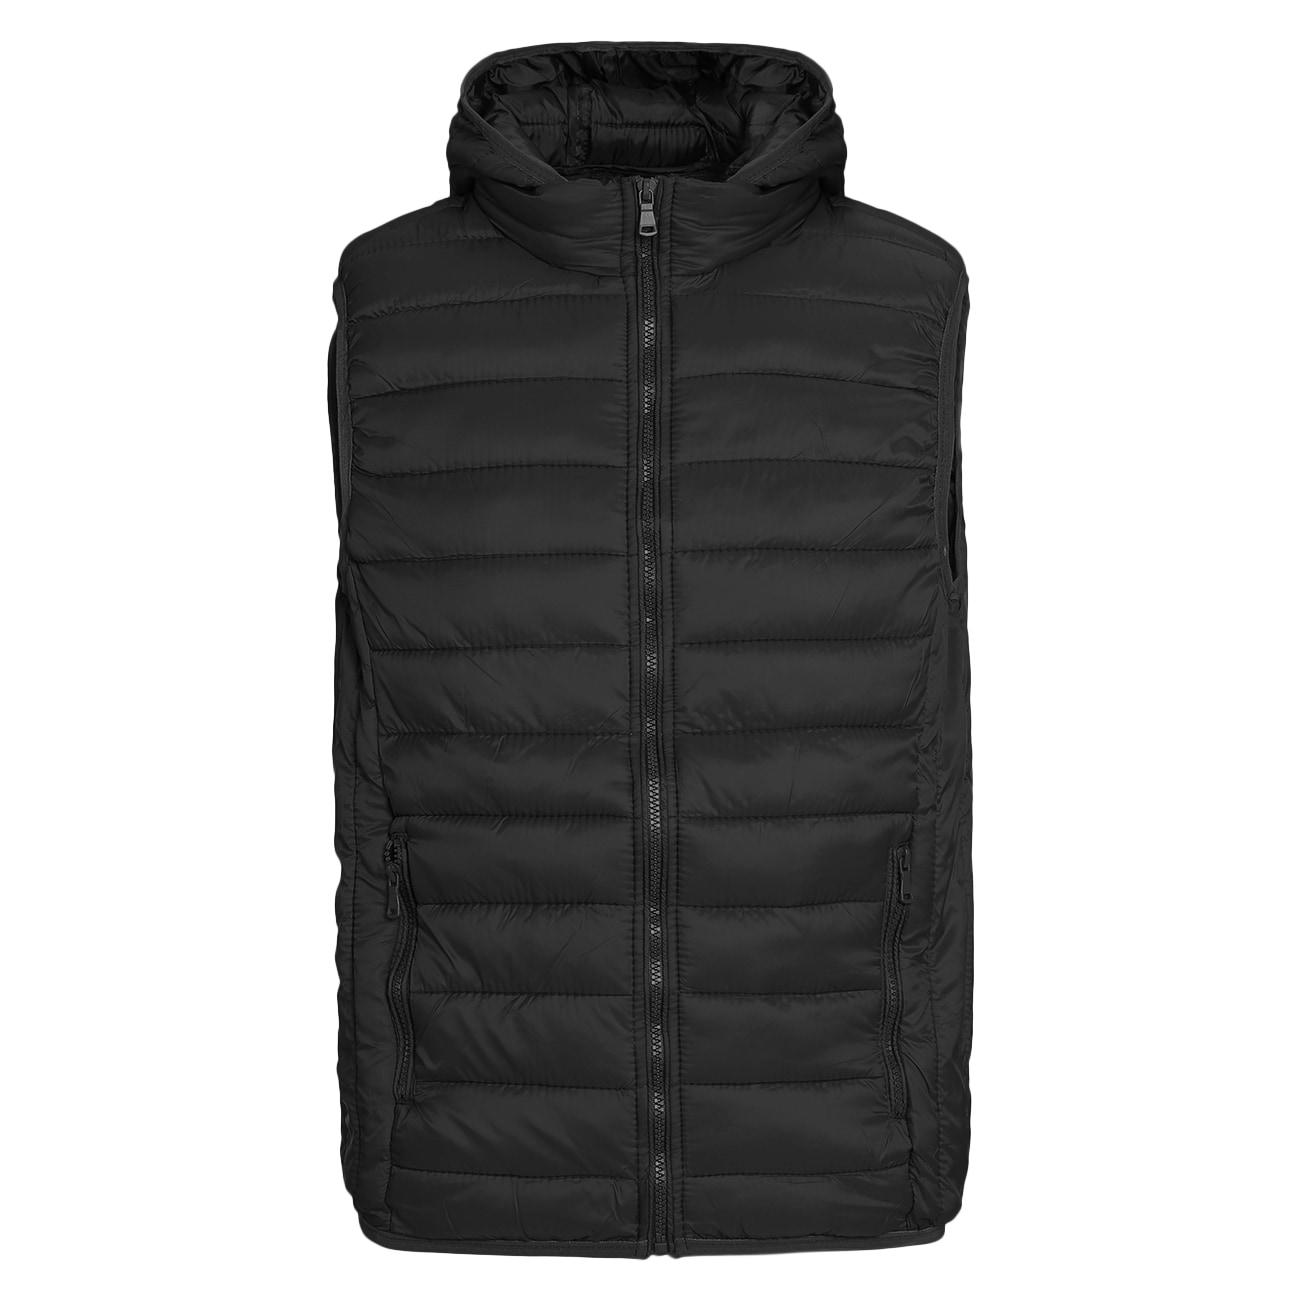 Mens black size large packable down vest colleague room tesco pension investment